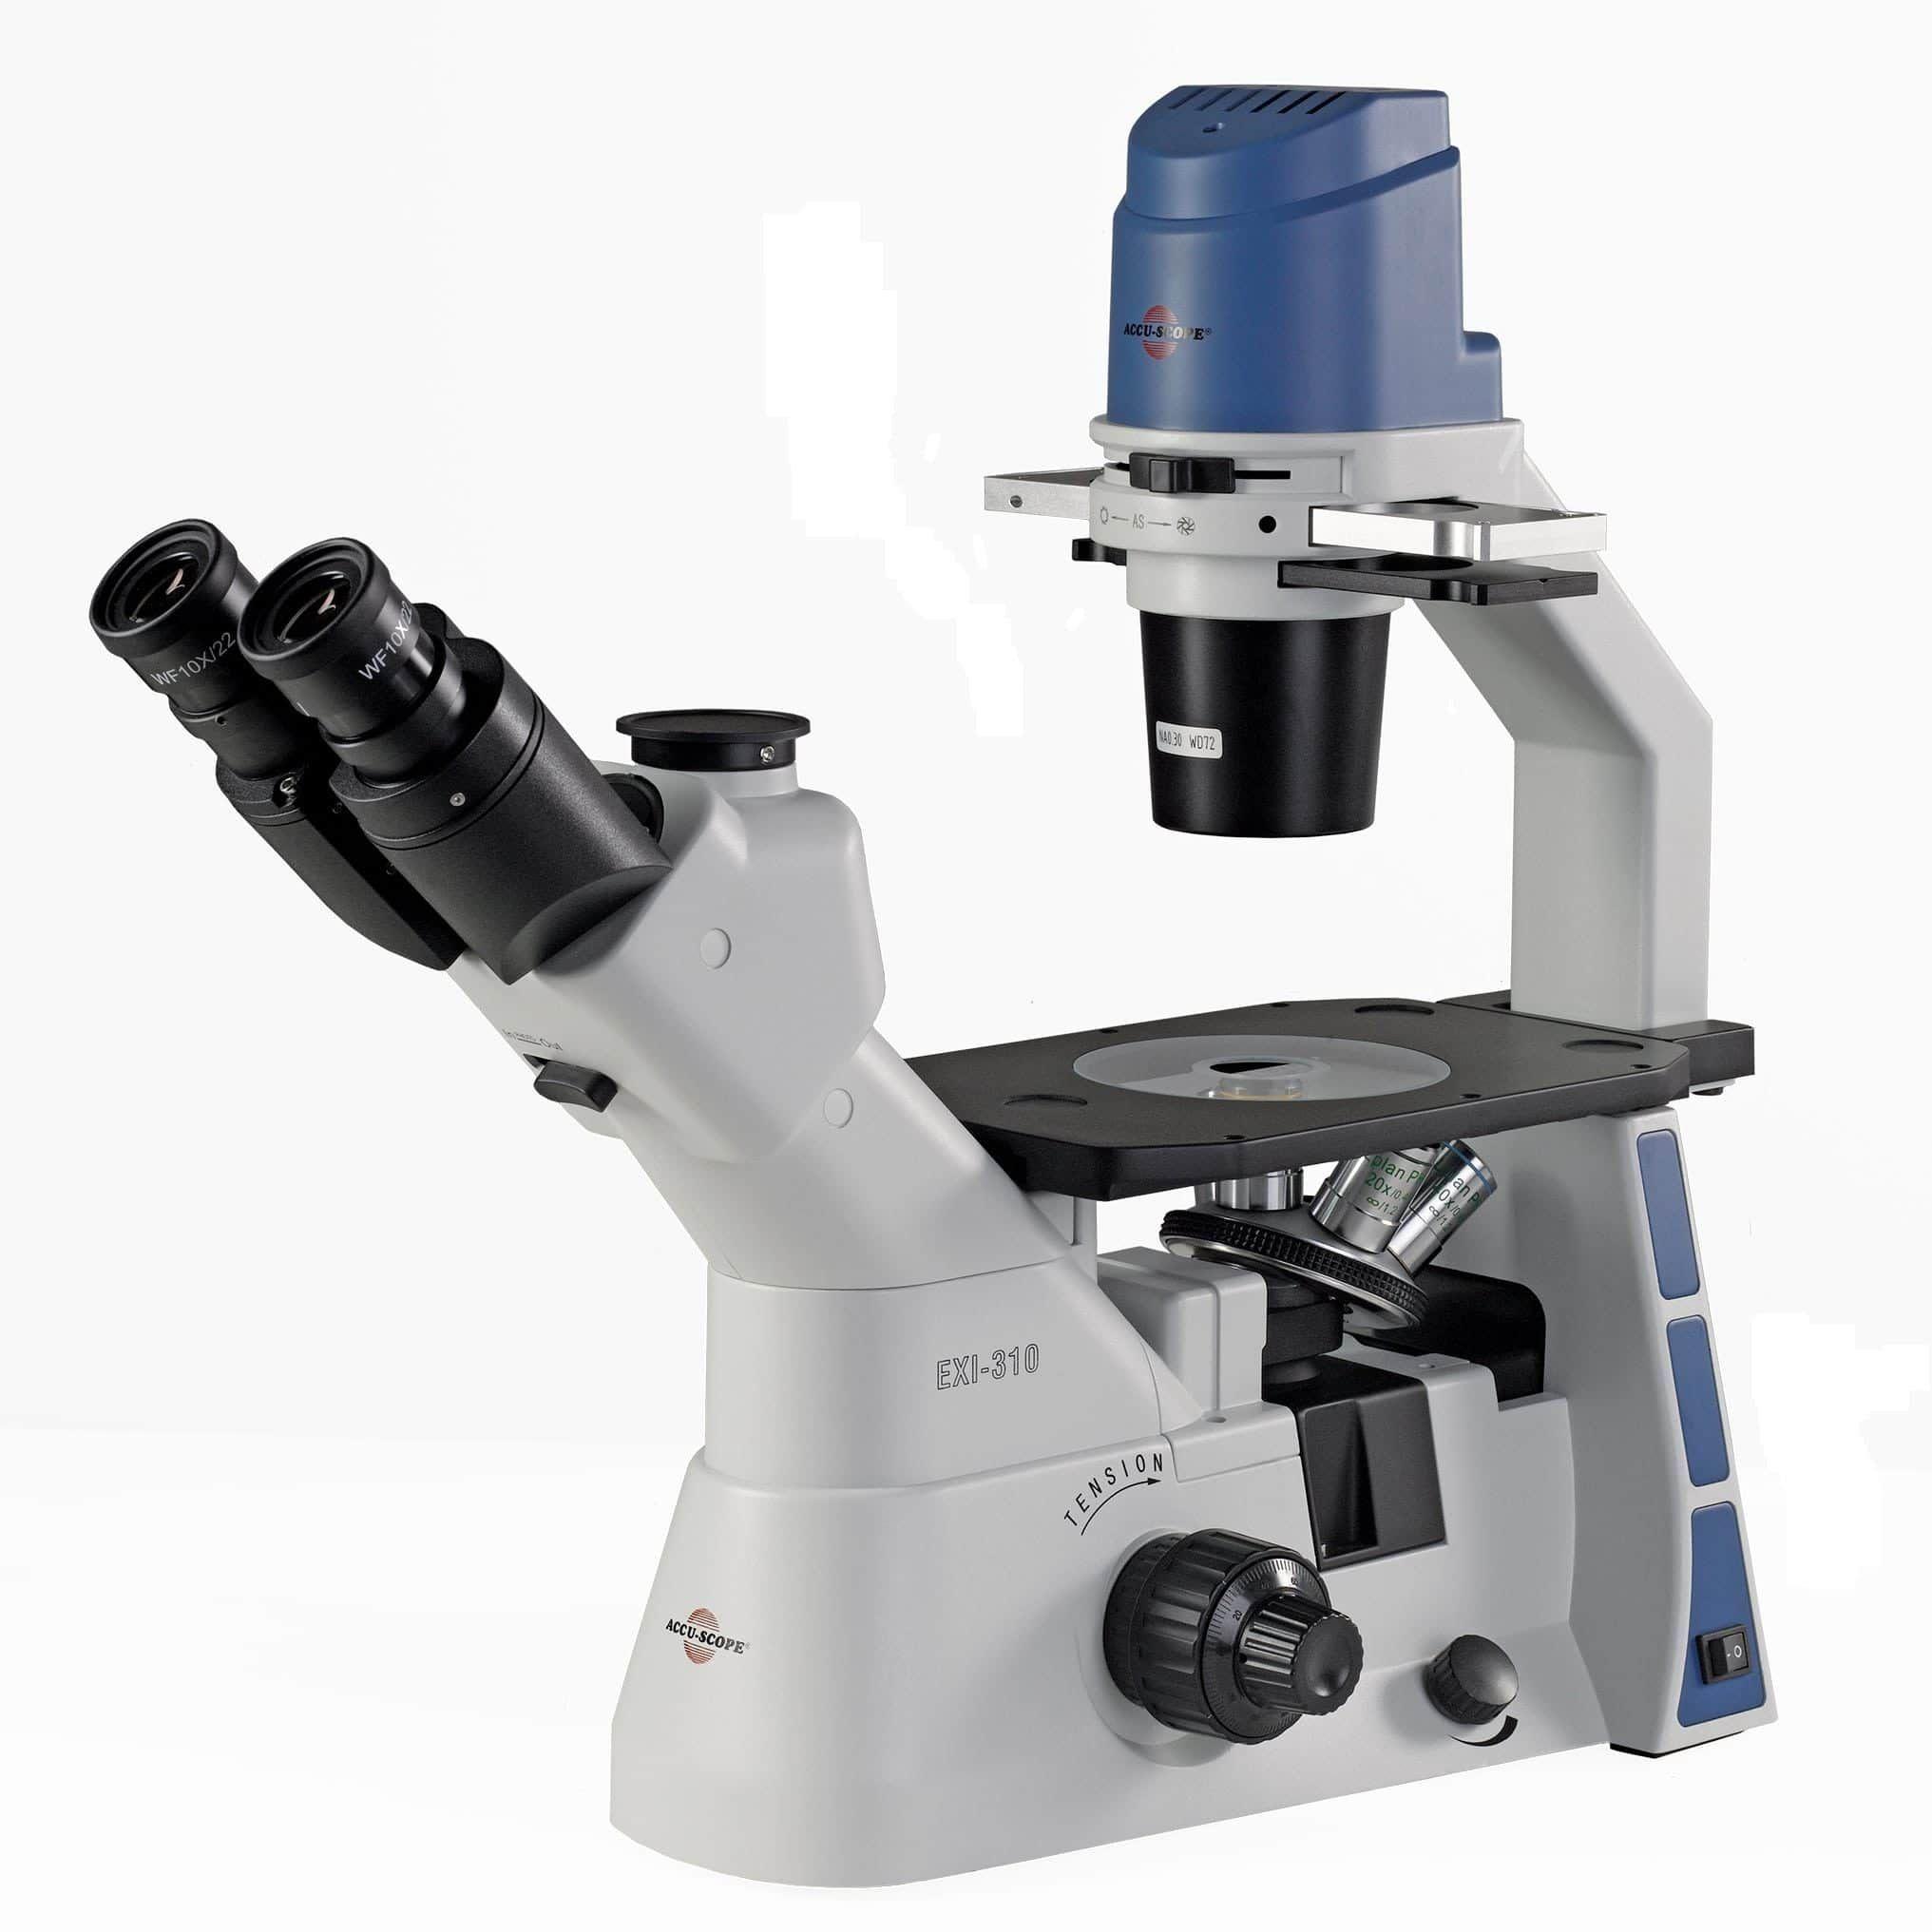 Accu-Scope EXI-310 Trinocular Inverted Microscope